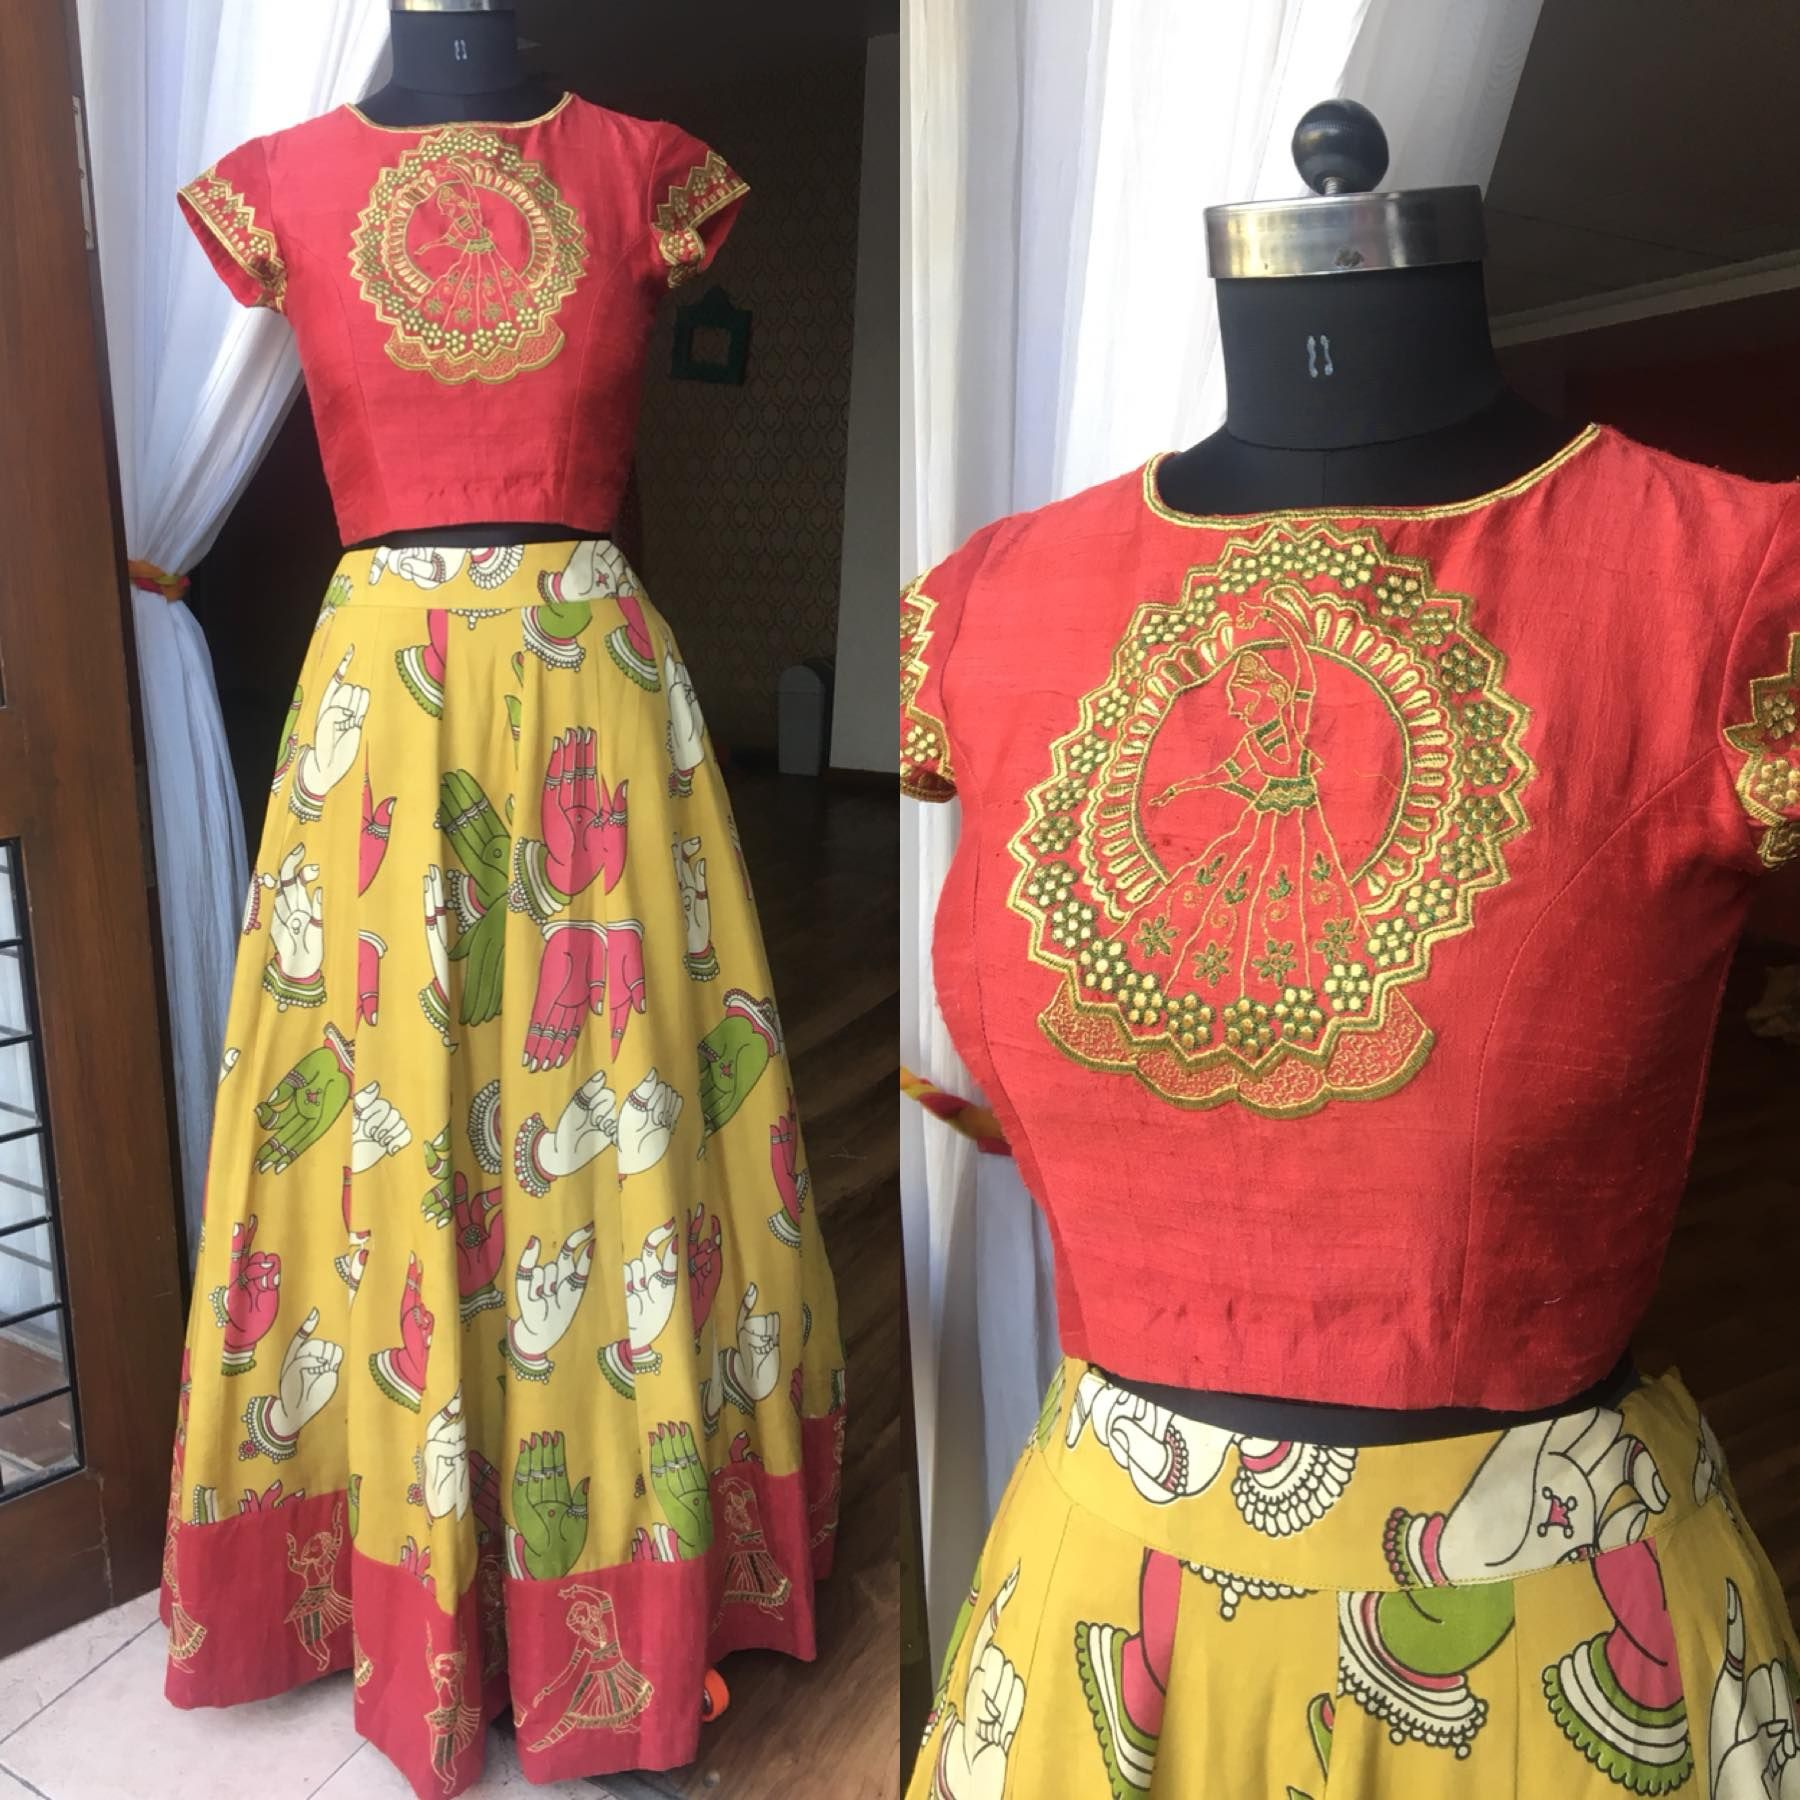 b187a6ec6e51d Fall in Love with Kalamkari . Beautiful kalamkari skirt with hand mudra  design. Crop top